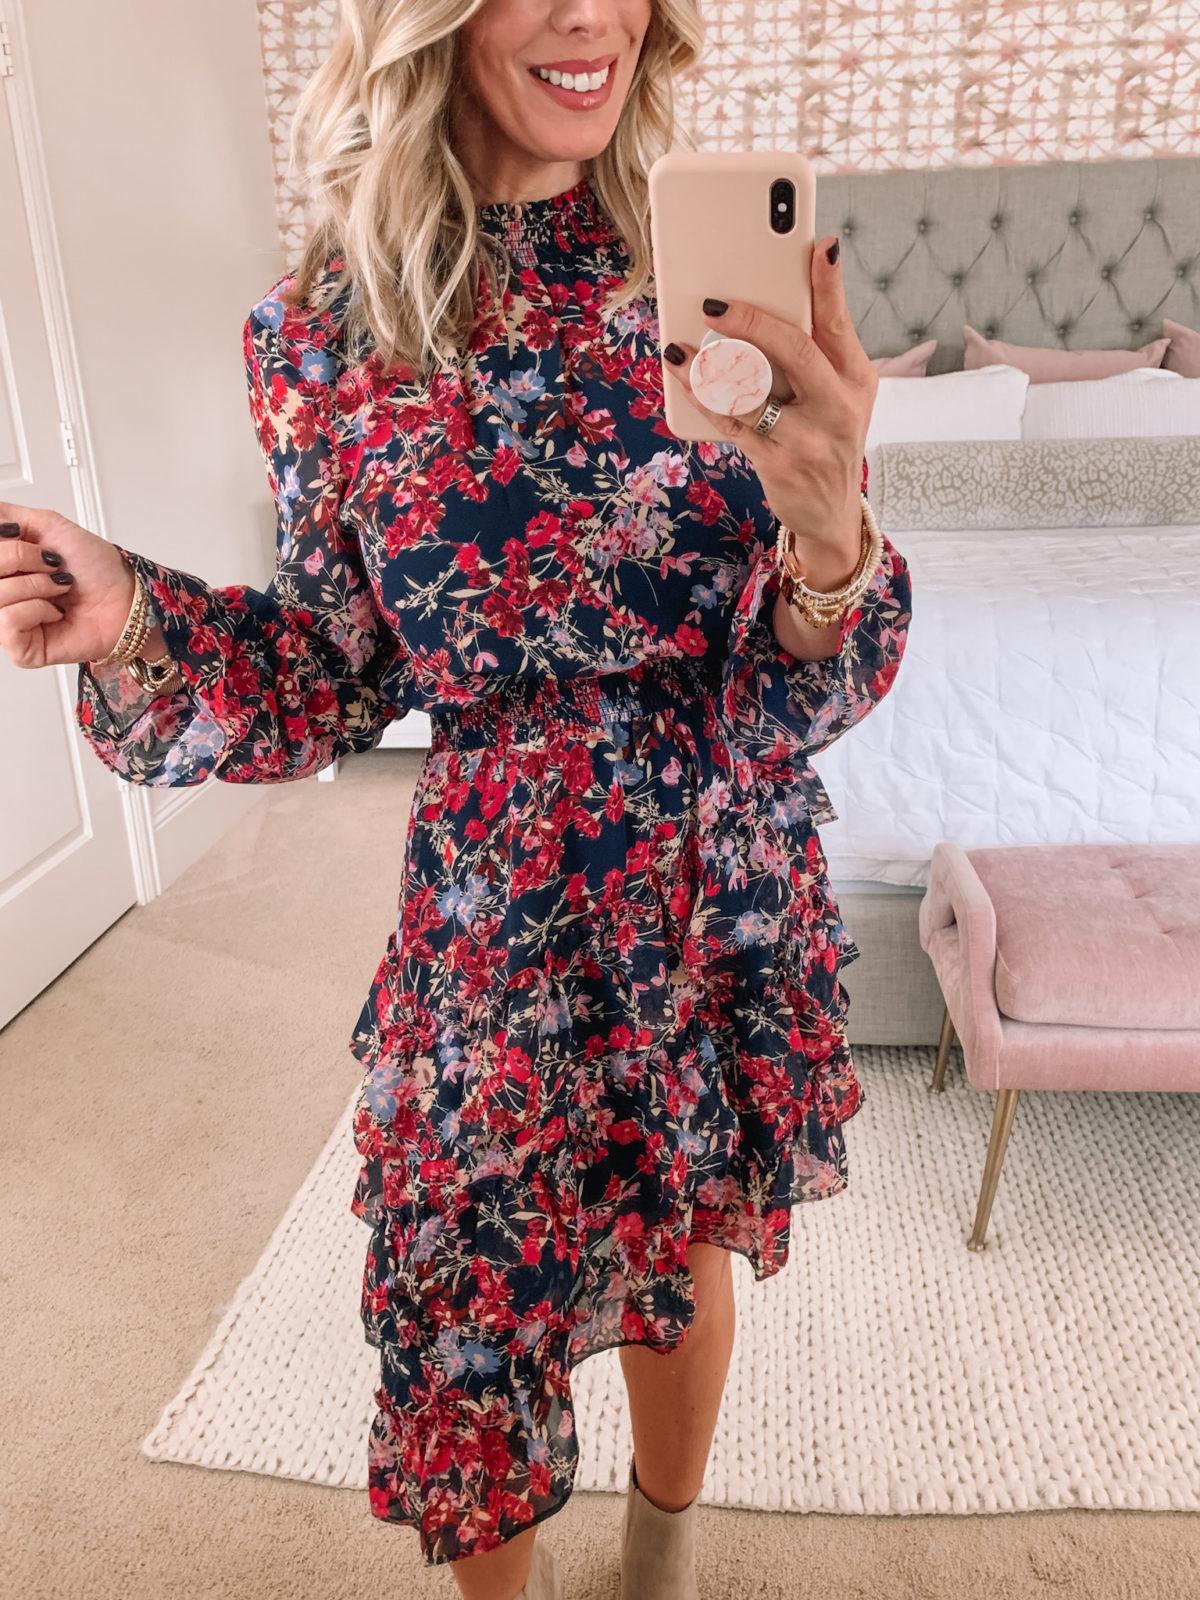 Walmart Fashion, Floral Midi Dress, Booties, Crossbody